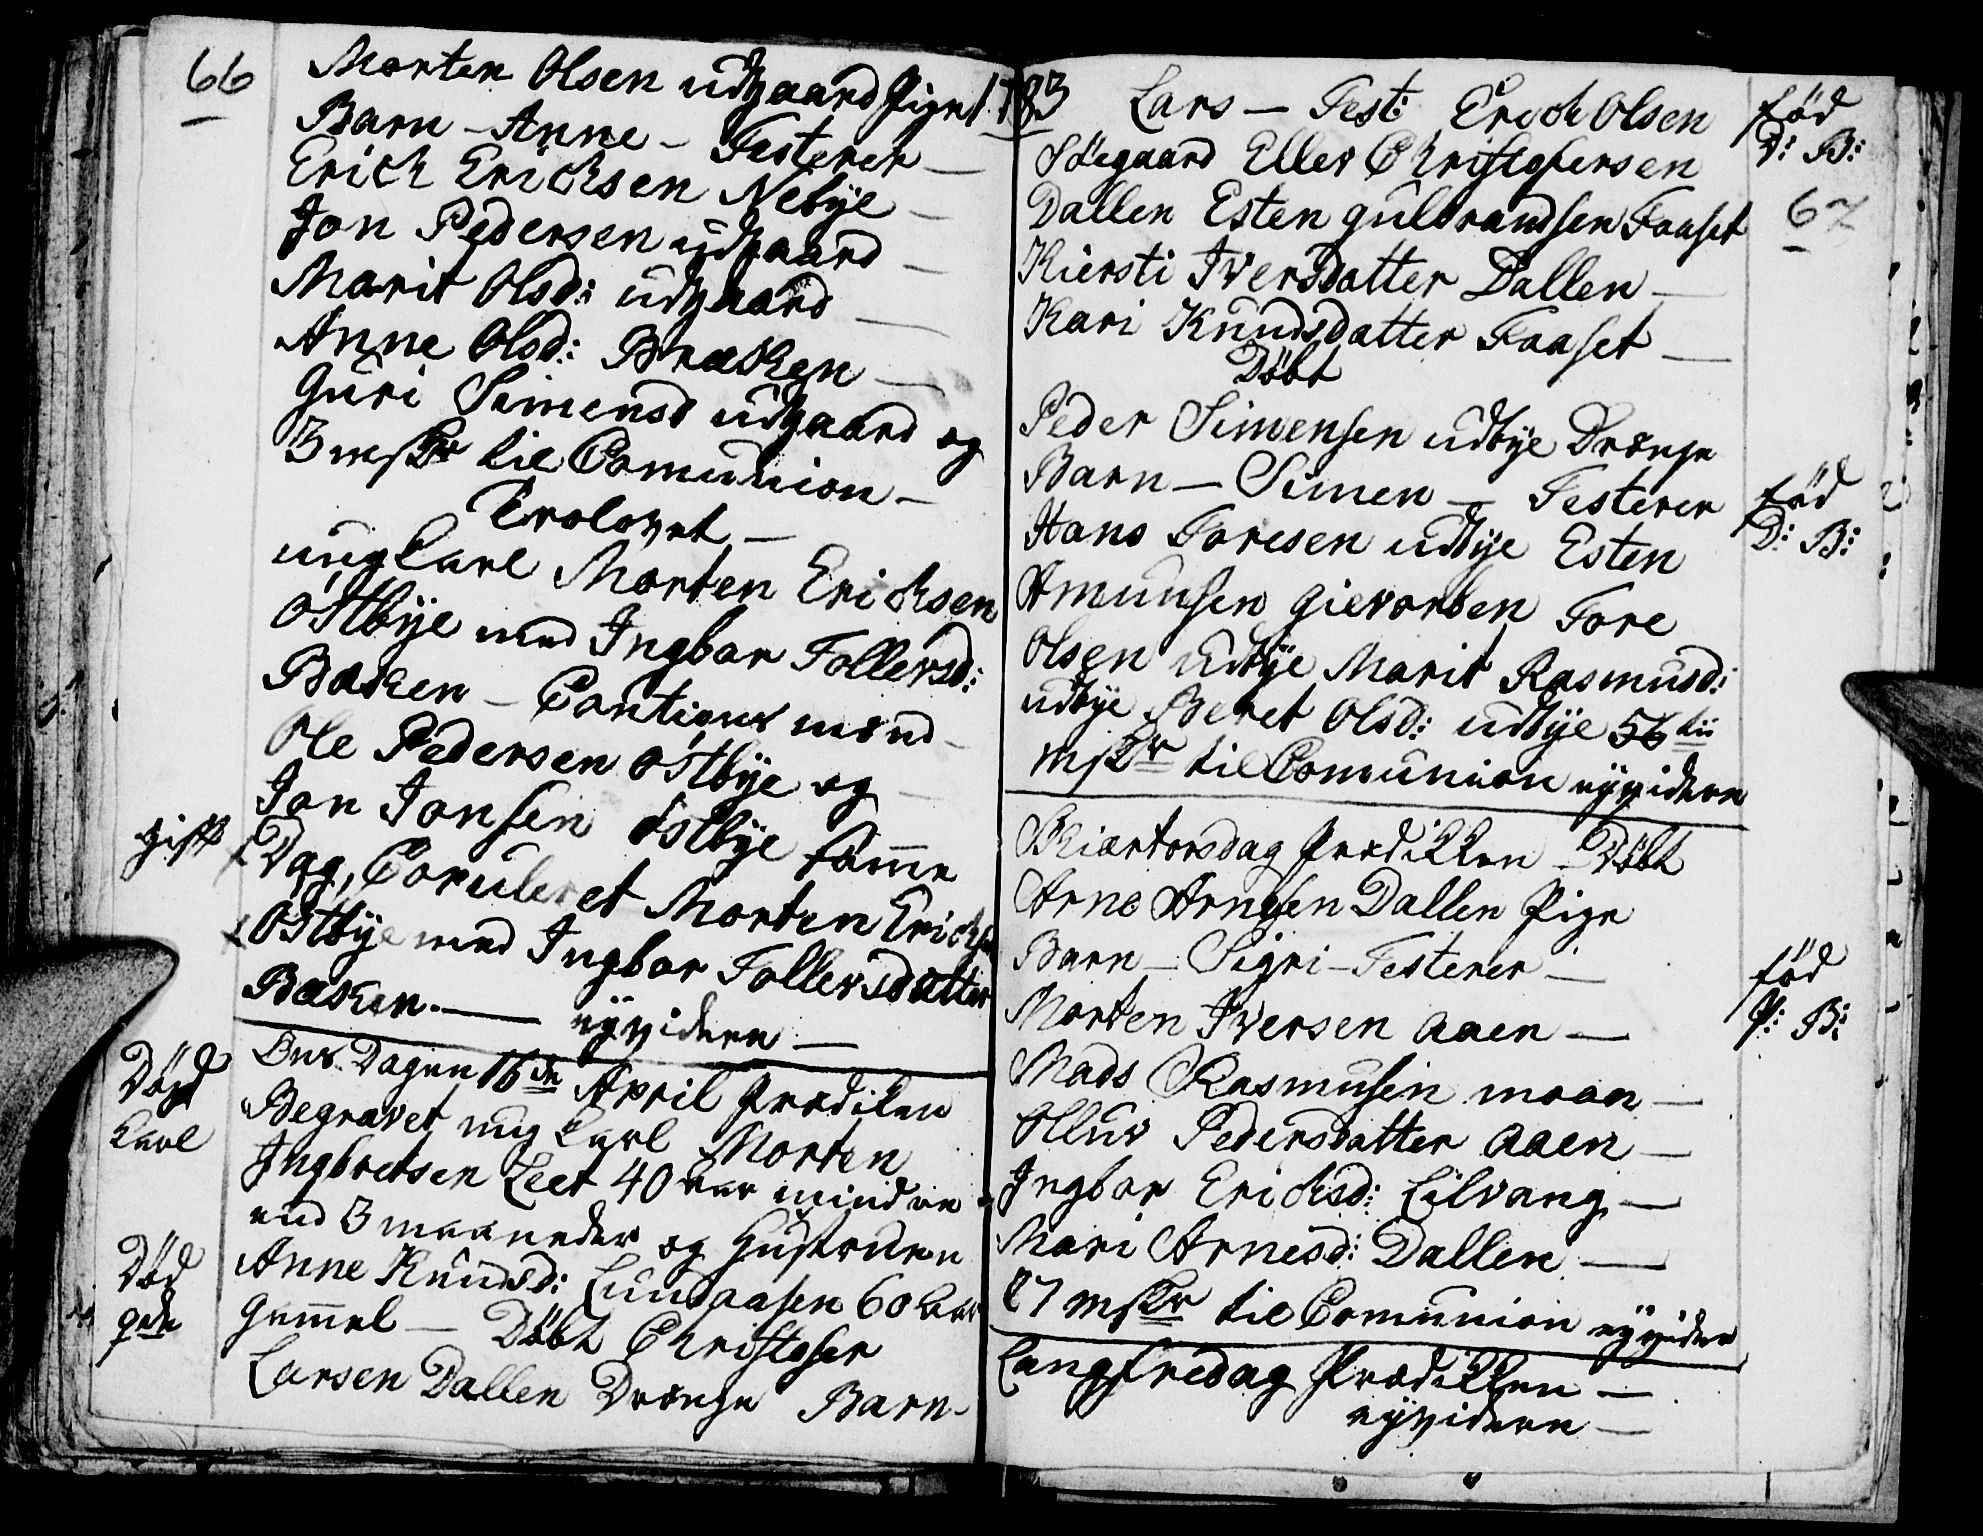 SAH, Tynset prestekontor, Ministerialbok nr. 12, 1780-1784, s. 66-67